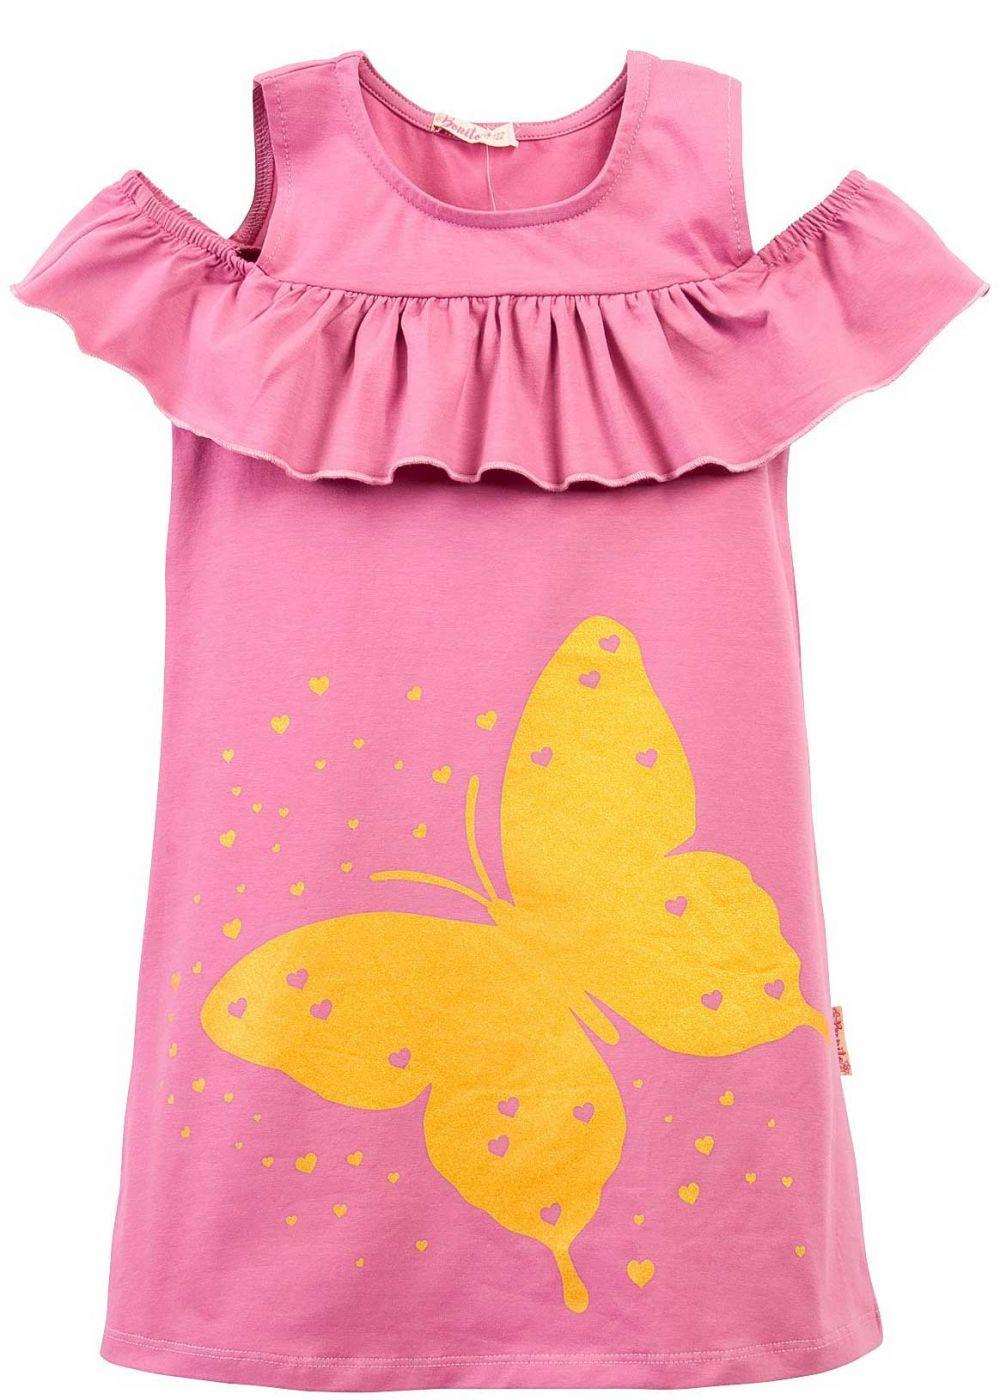 Платье на девочки Bonito сиреневое с бабочкой